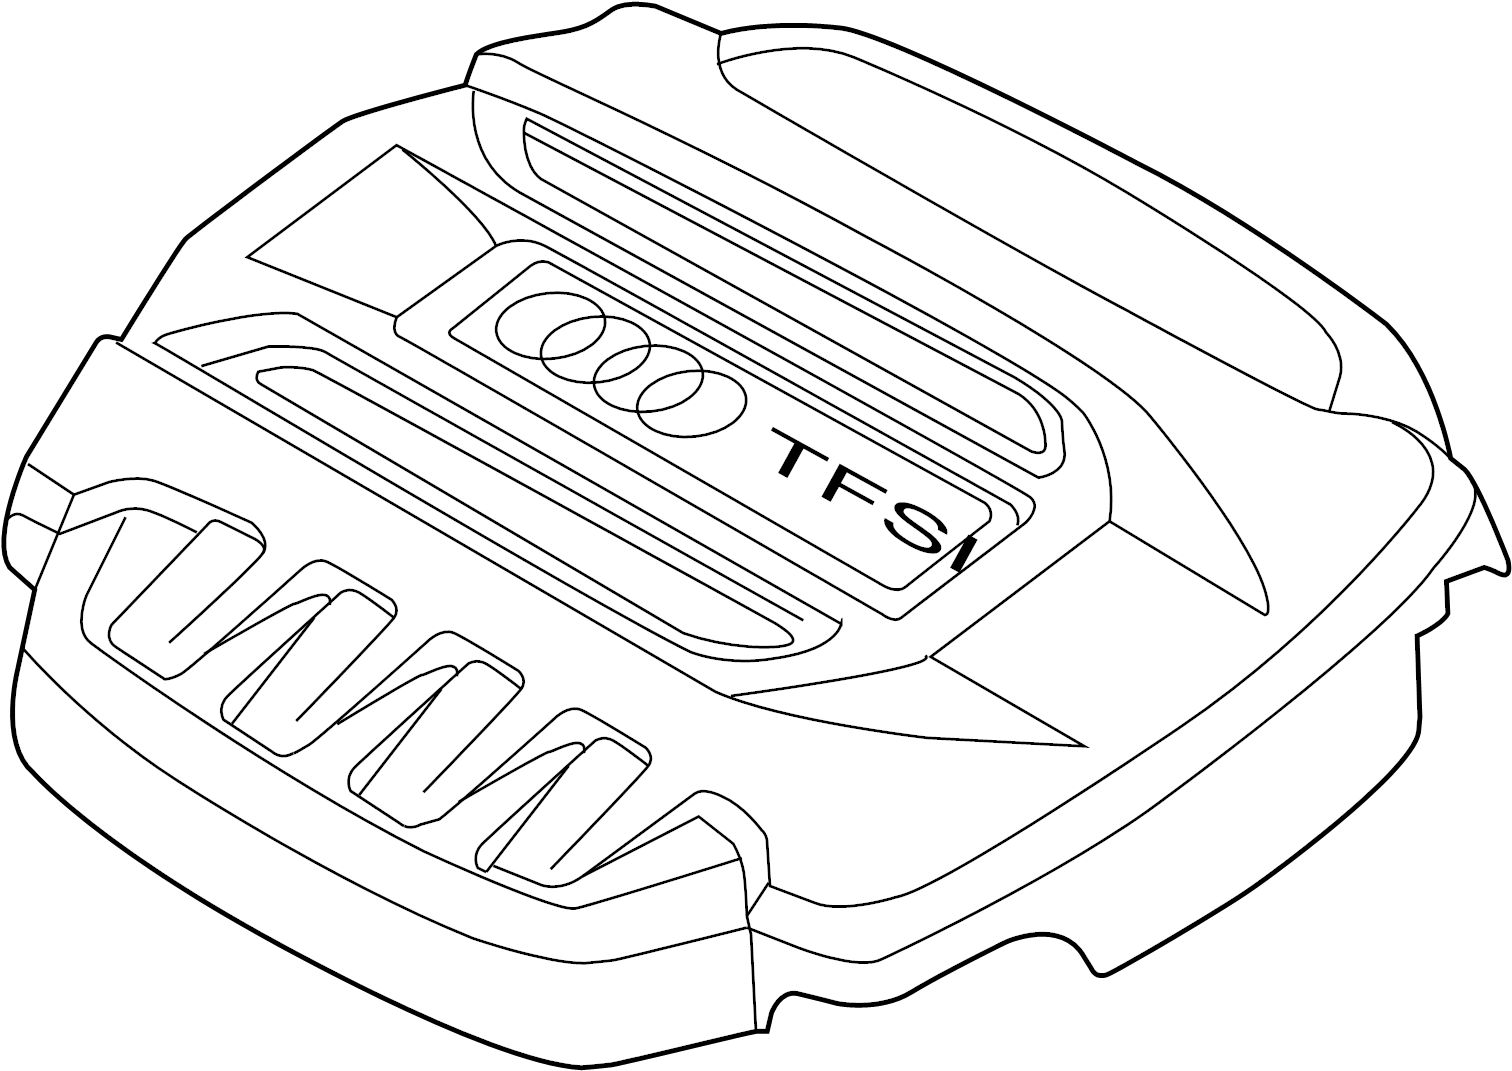 2017 audi tt engine cover  liter  convertible  transaxle